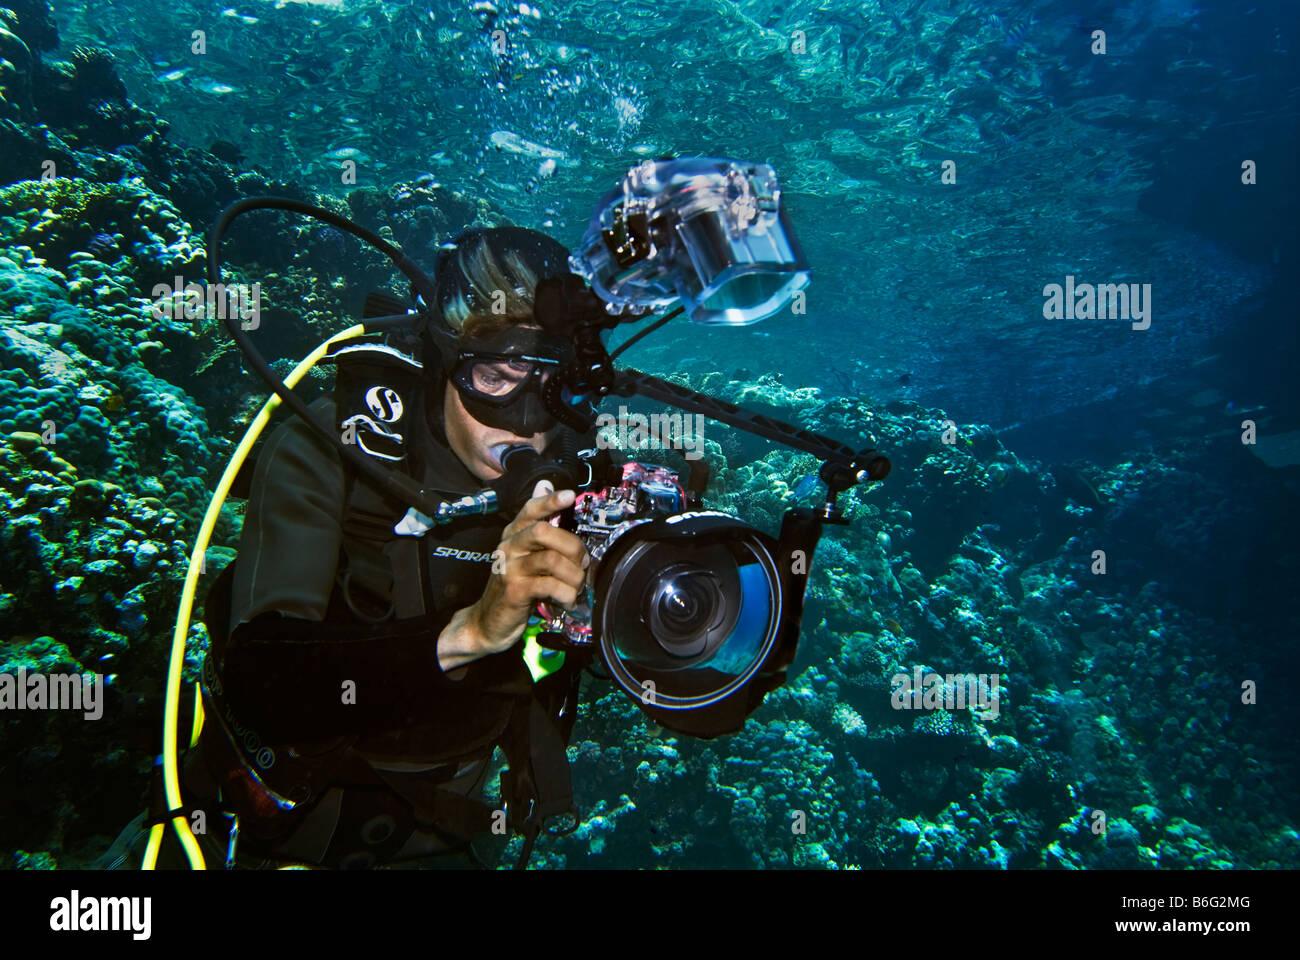 photographer diver scuba diving underwater under water camera reef riff at Marsa Nakara Marsa Alam camera flash - Stock Image